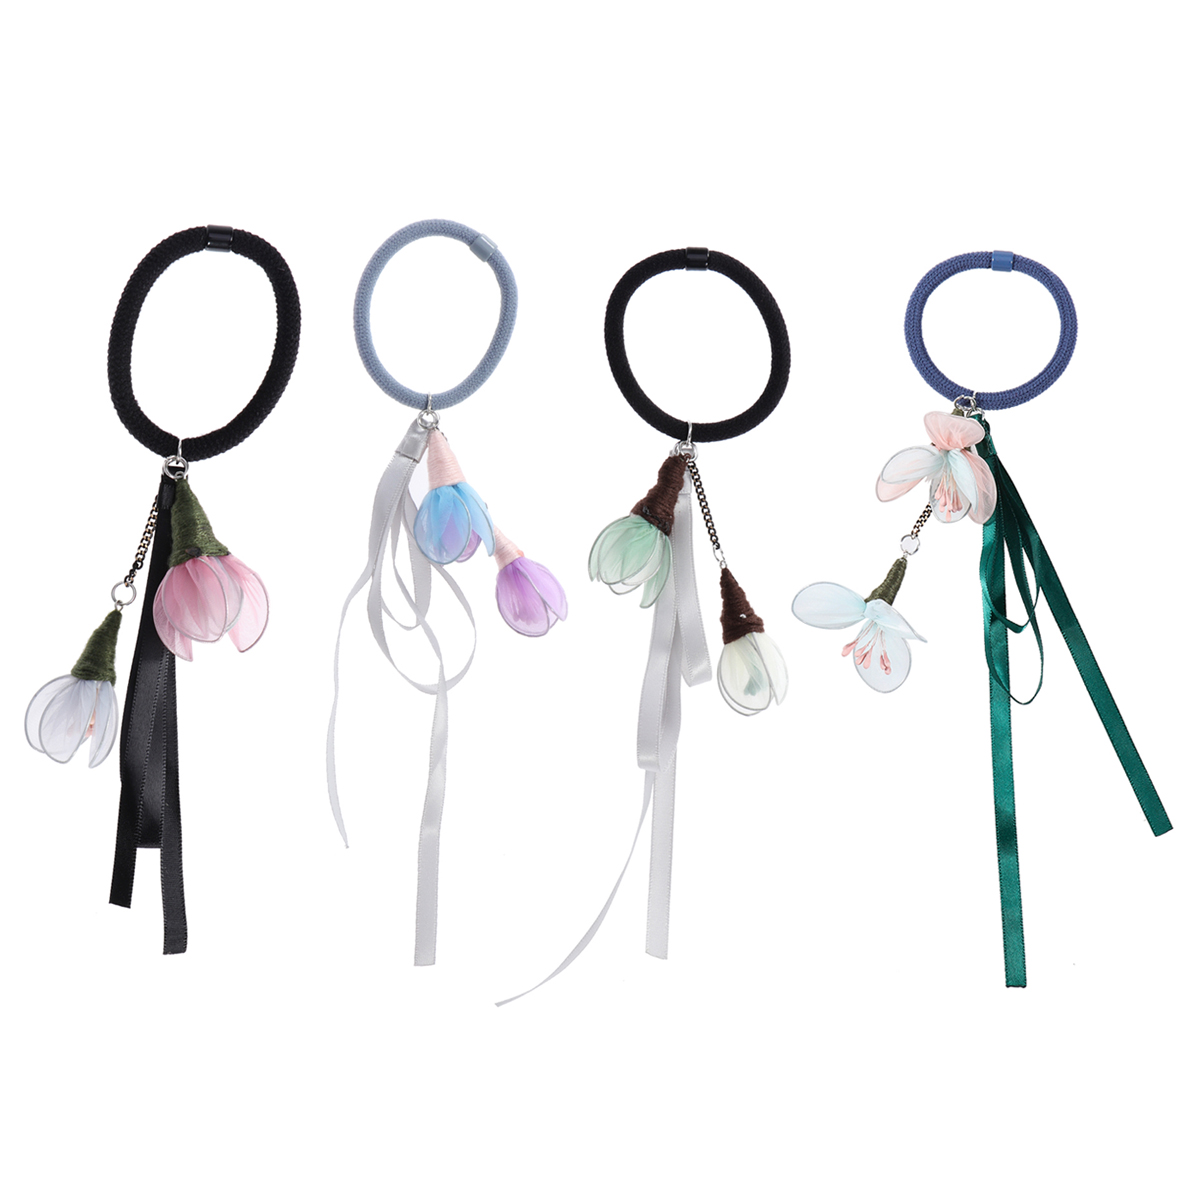 Women Elastic Hair Bands Hair Accessories Ponytail Holders Girls Flower Hair Rope Tie Band